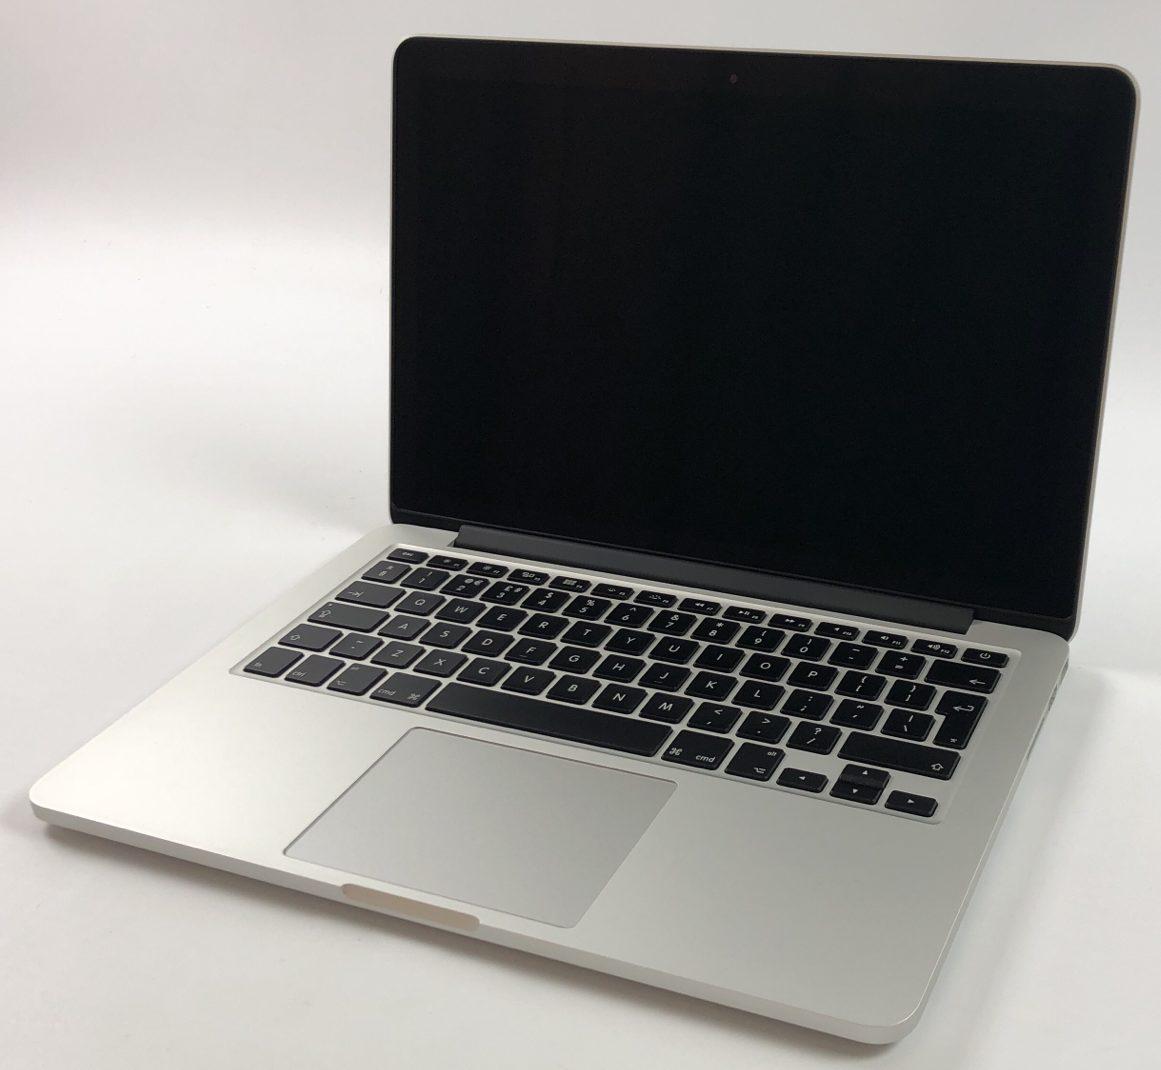 "MacBook Pro Retina 13"" Mid 2014 (Intel Core i5 2.6 GHz 8 GB RAM 256 GB SSD), Intel Core i5 2.6 GHz, 8 GB RAM, 256 GB SSD, image 1"